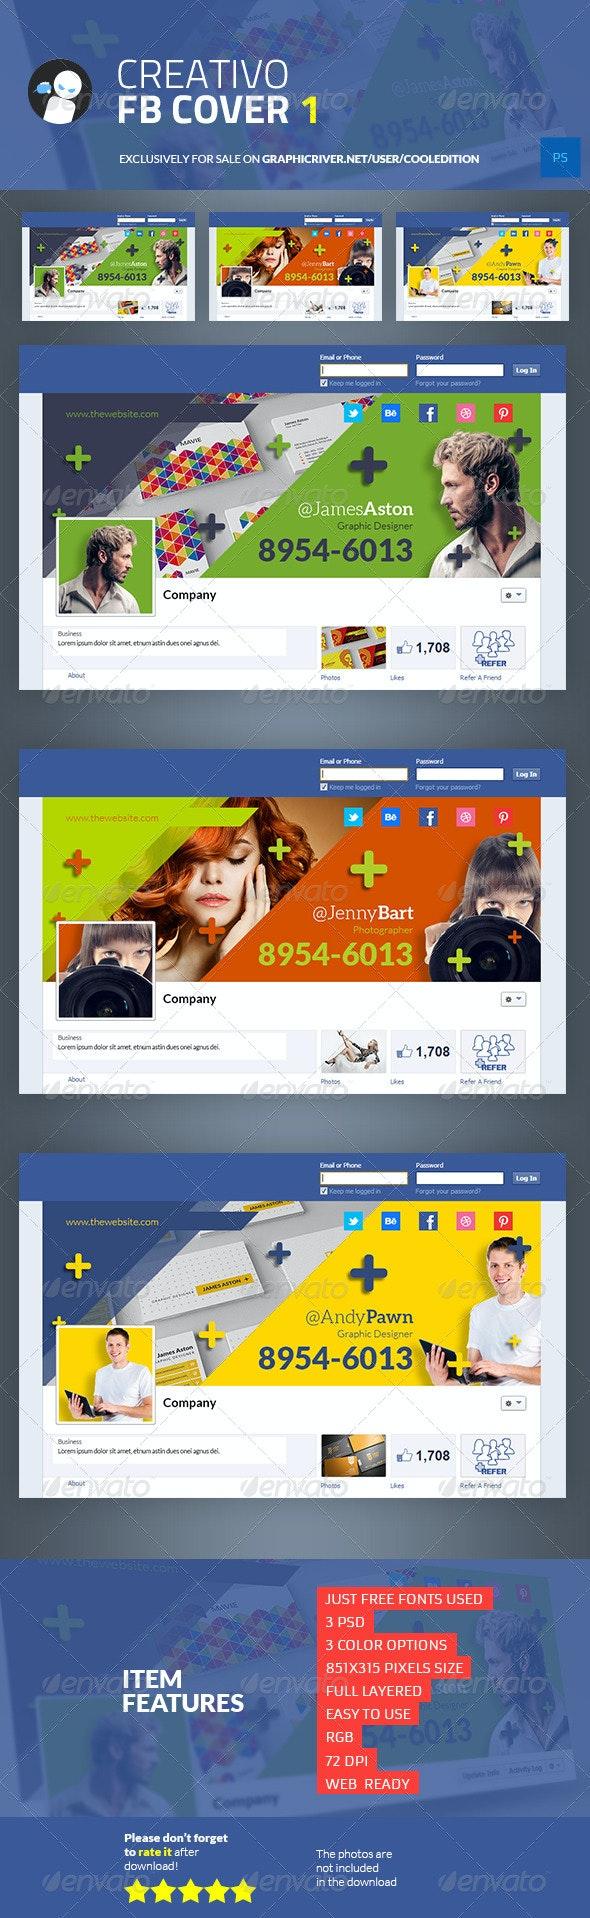 Creativo Facebook Cover 1 - Facebook Timeline Covers Social Media